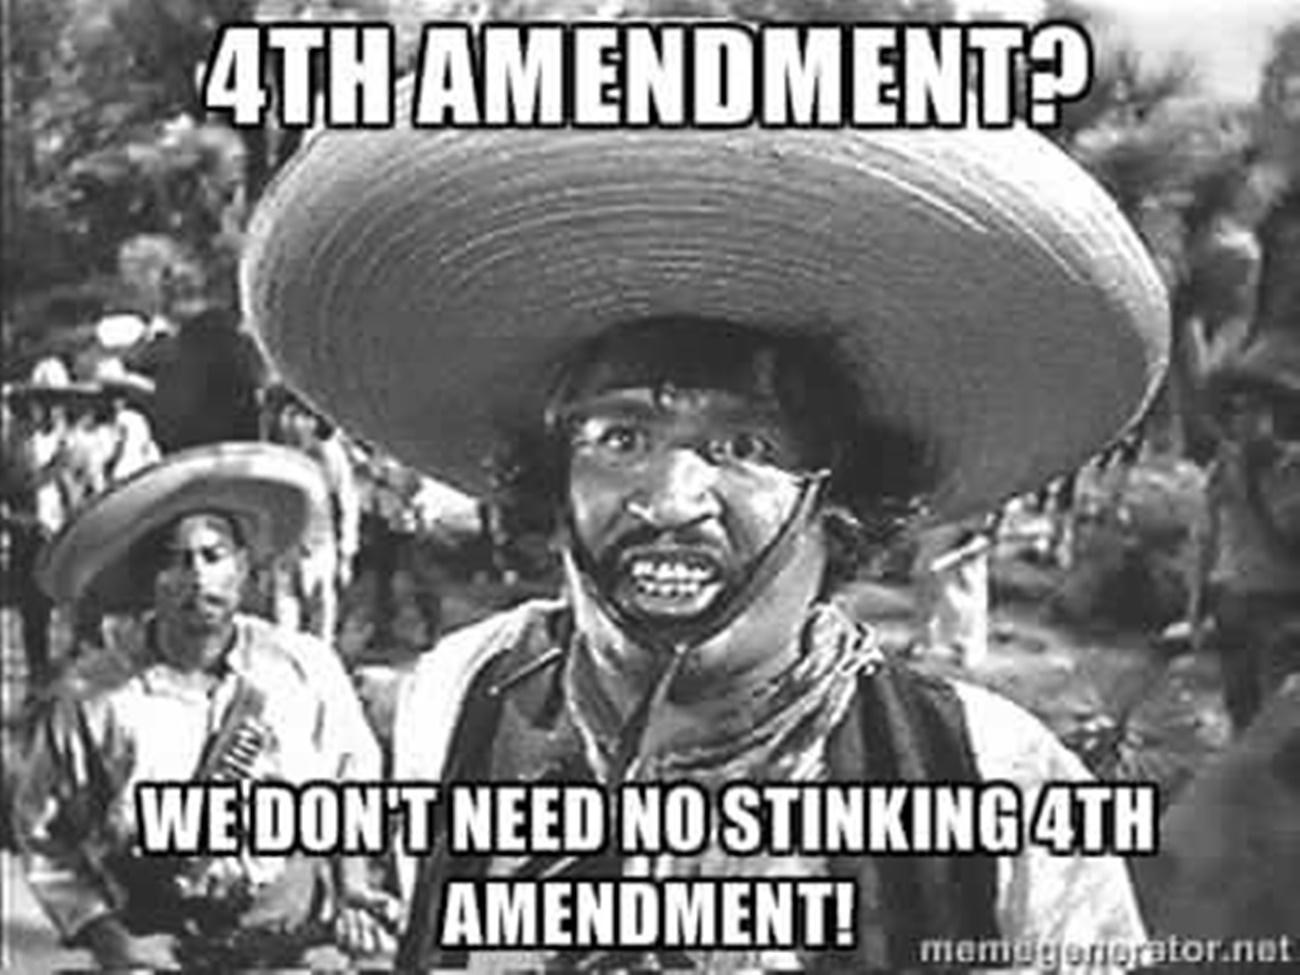 Obama Administration: 4th Amendment? What 4th Amendment?